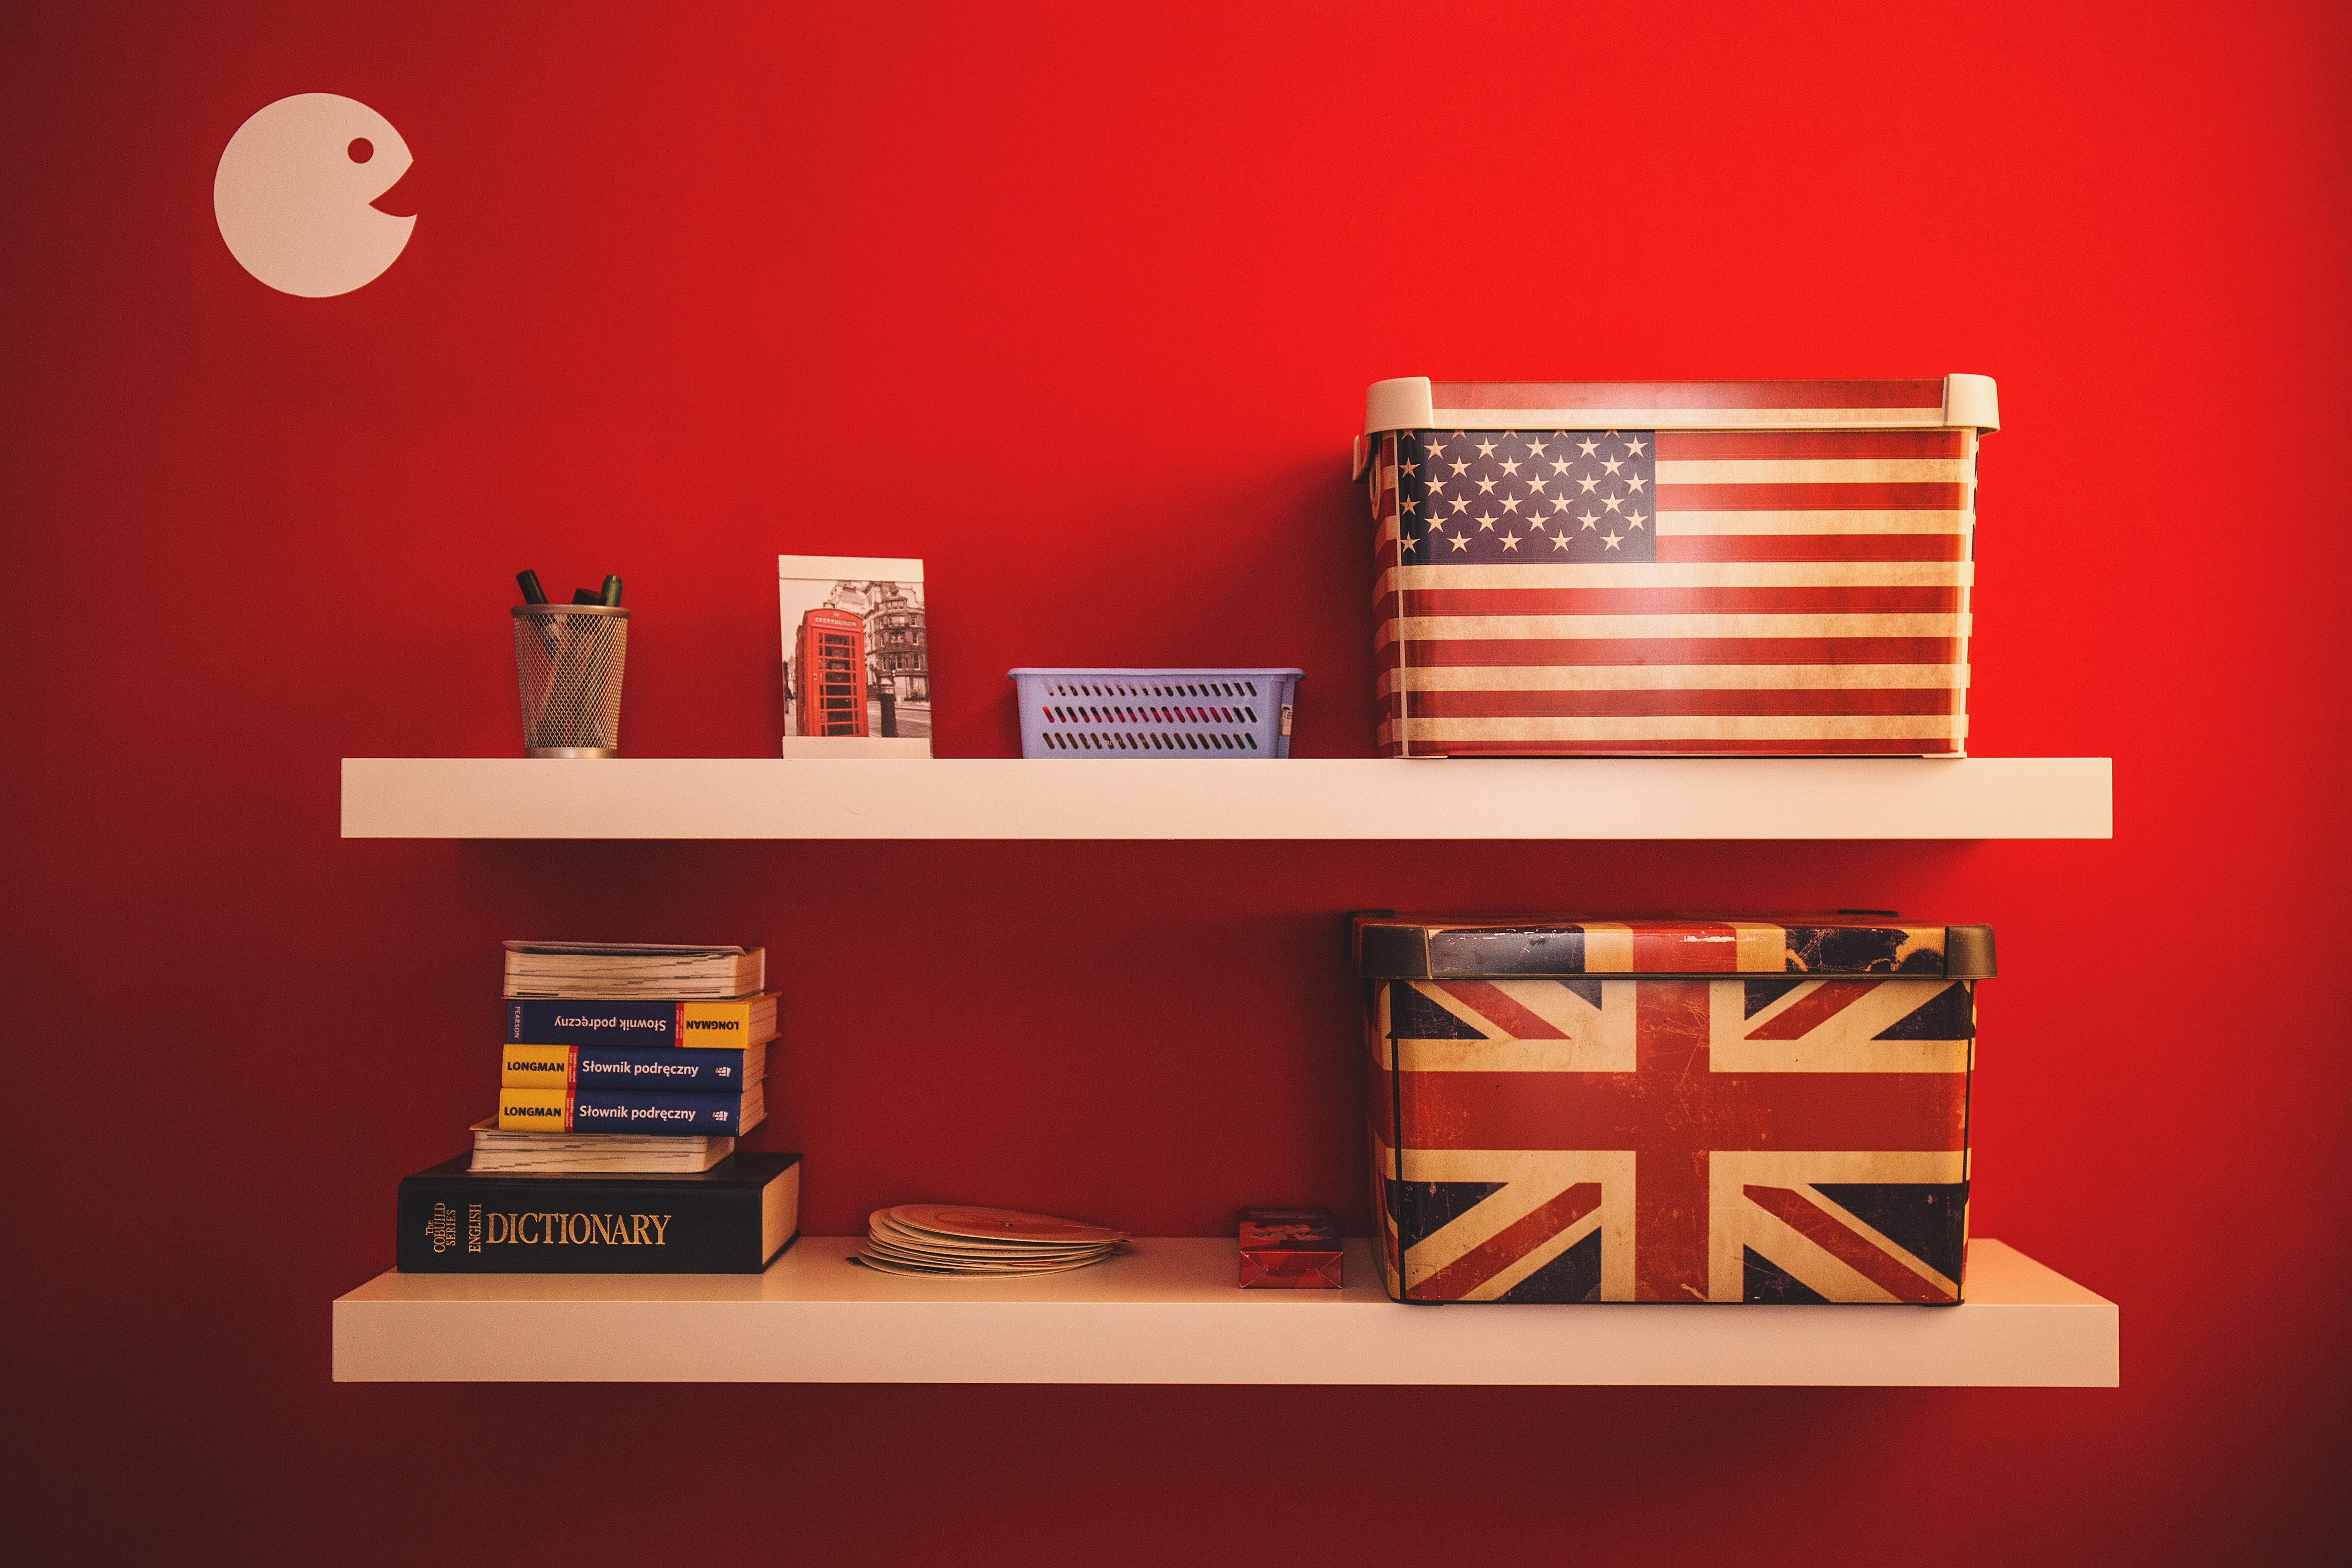 Innenarchitektur Usa kostenlose foto innere mauer rot usa amerikanische flagge